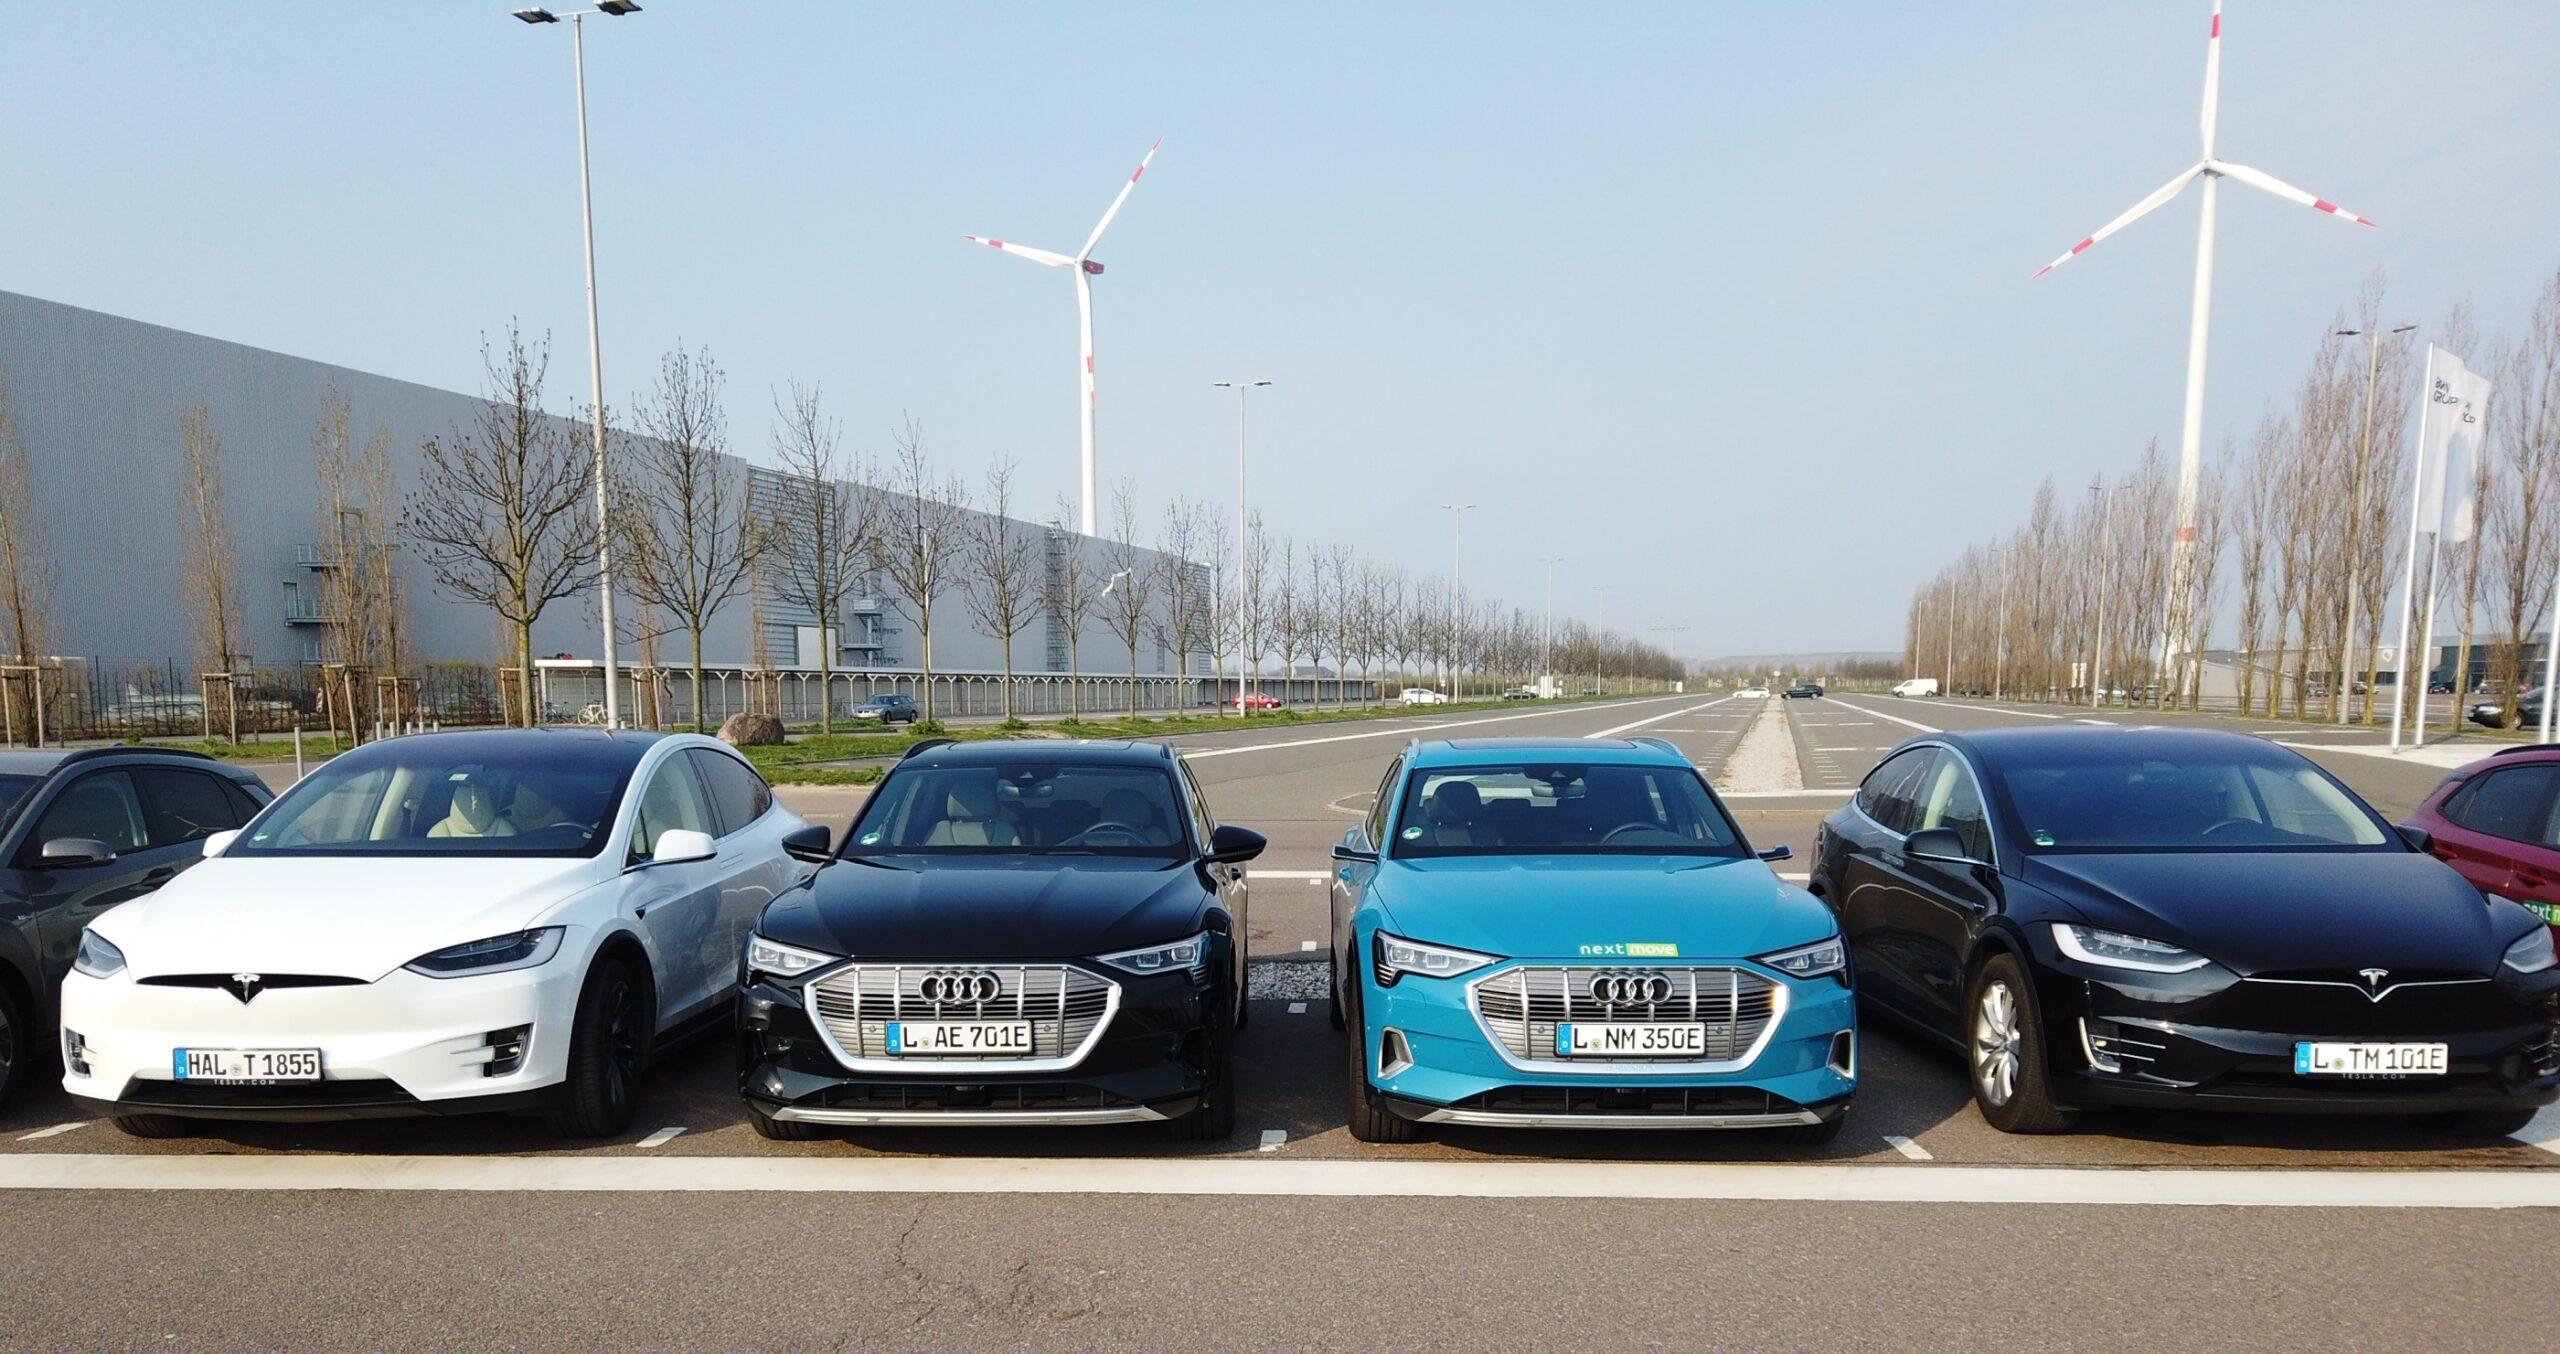 nextmove Autobahn Test - Tesla Model X vs. Audi etron